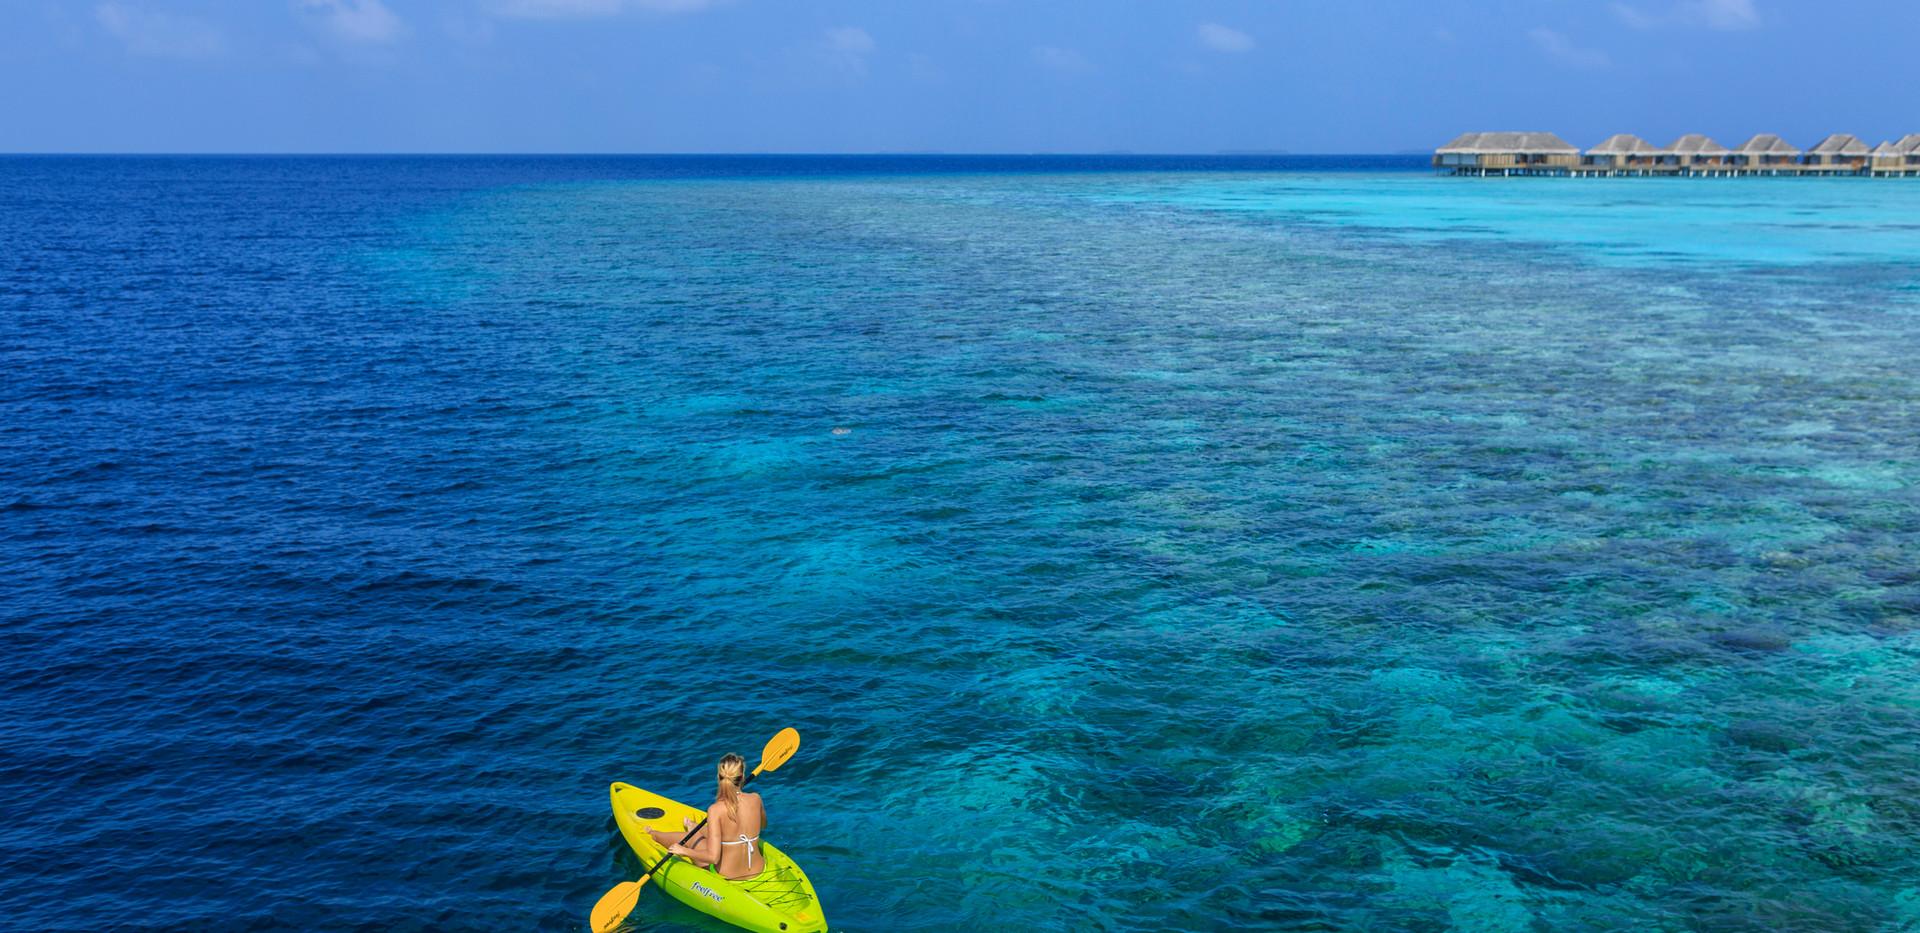 Dusit_Thani_Maldives-6876.jpg